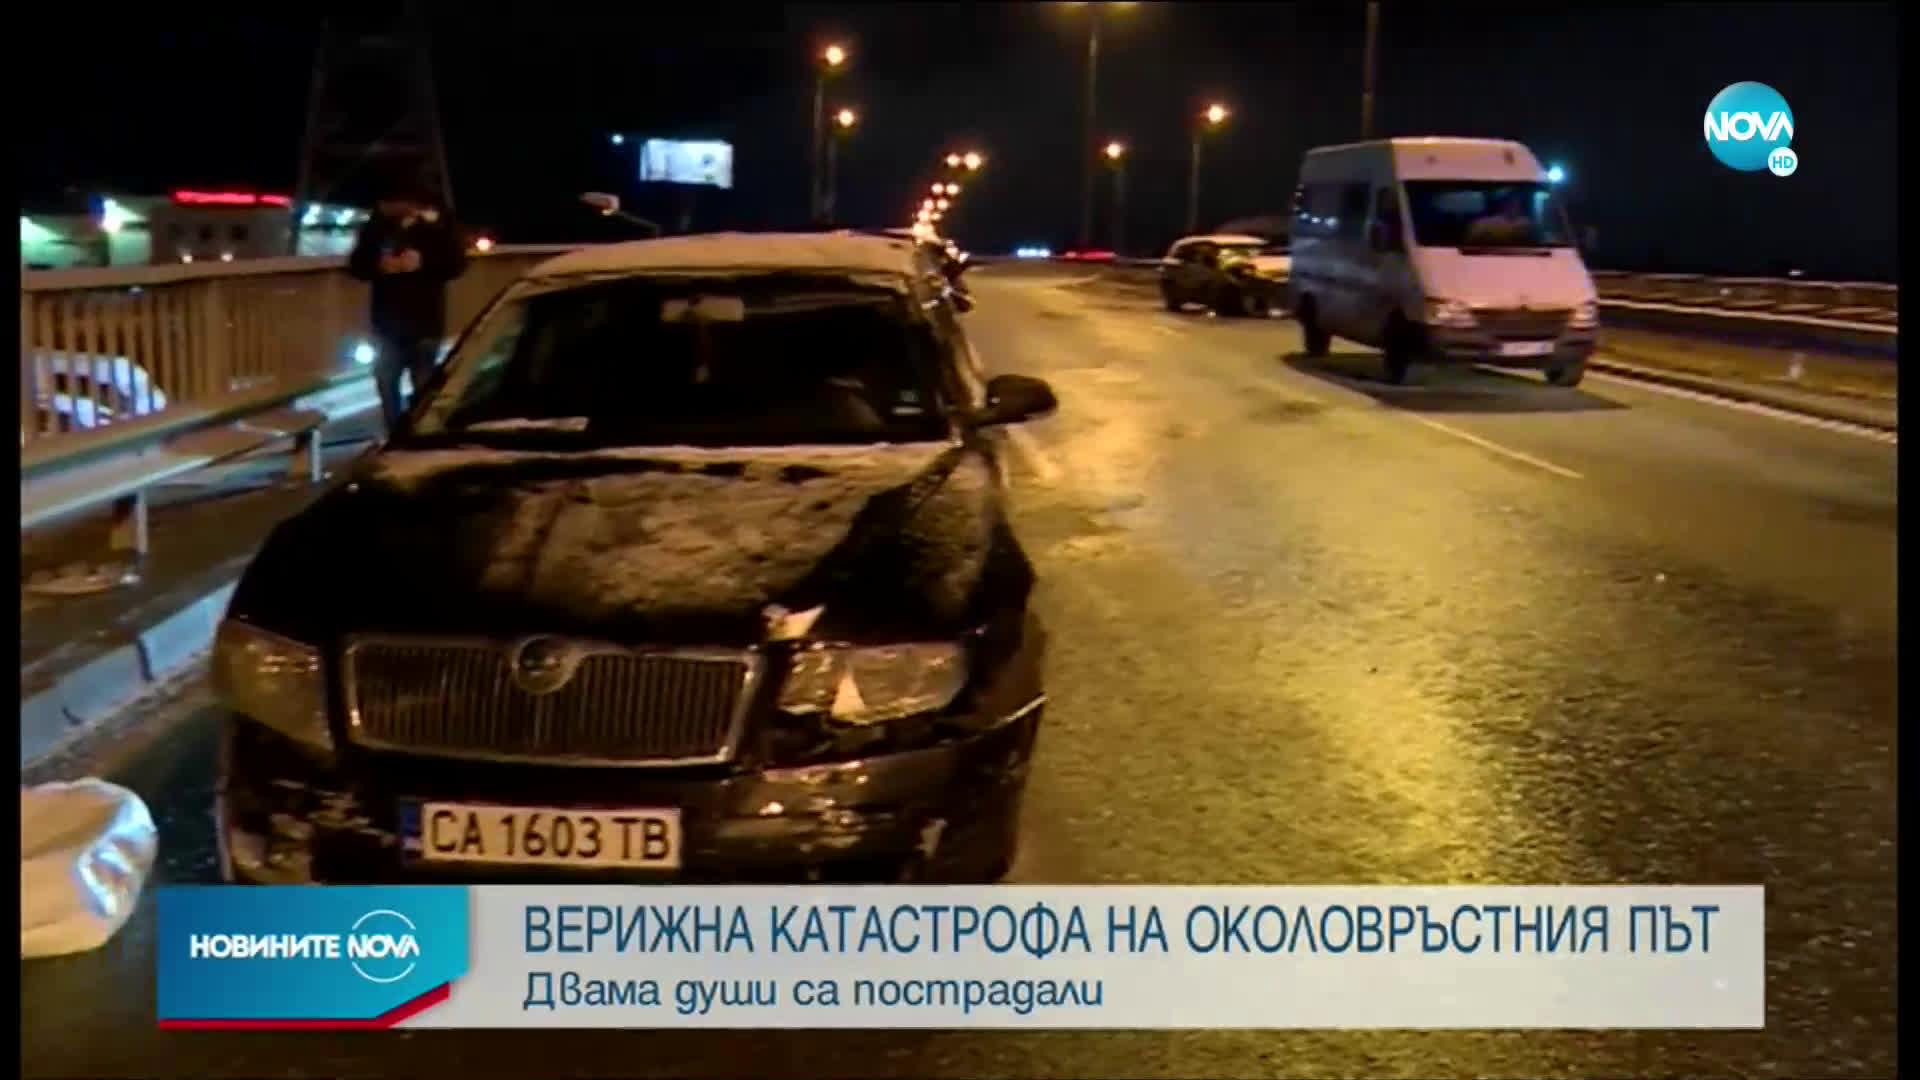 Катастрофа с около 10 коли на Околовръстното в София